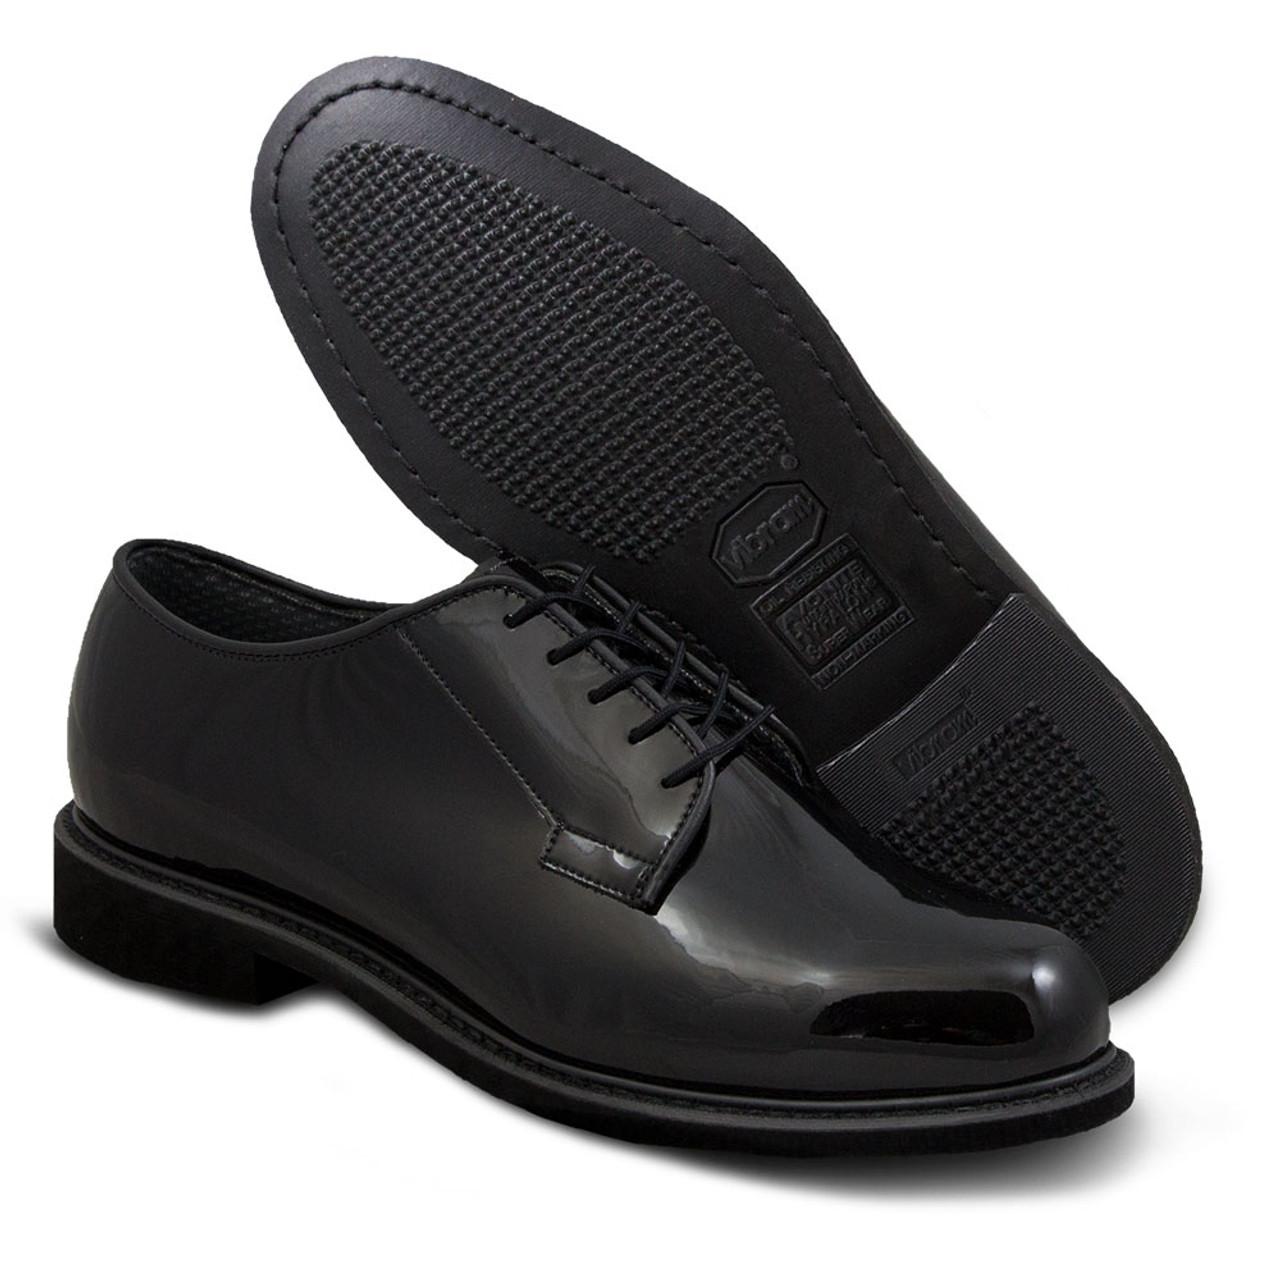 ALTAMA DRESS OXFORD / BLACK